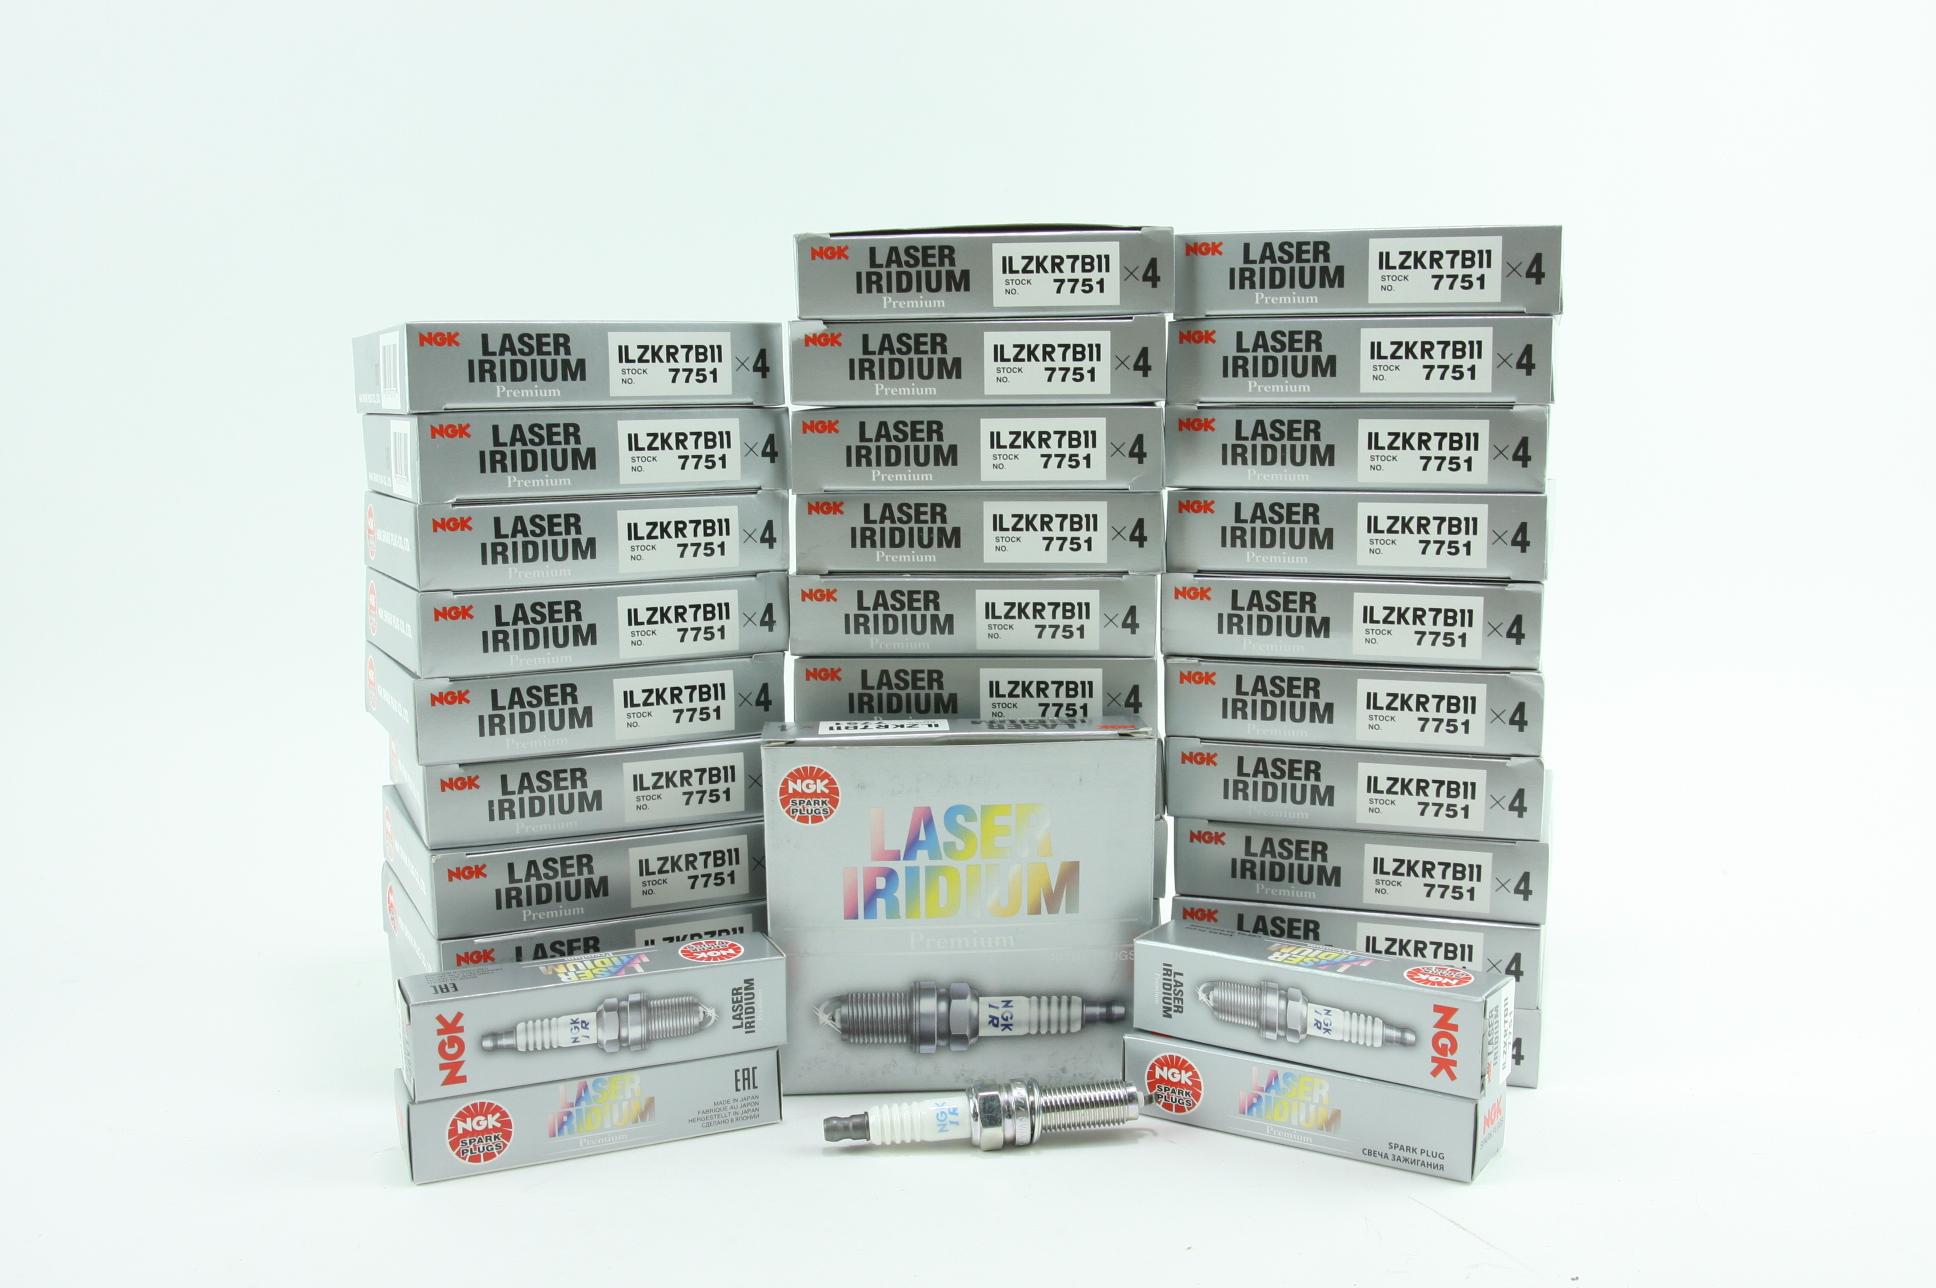 New Set of 120 (Case) NGK 7751 ILZKR7B11 Laser Iridium and Platinum Spark Plugs - image 1